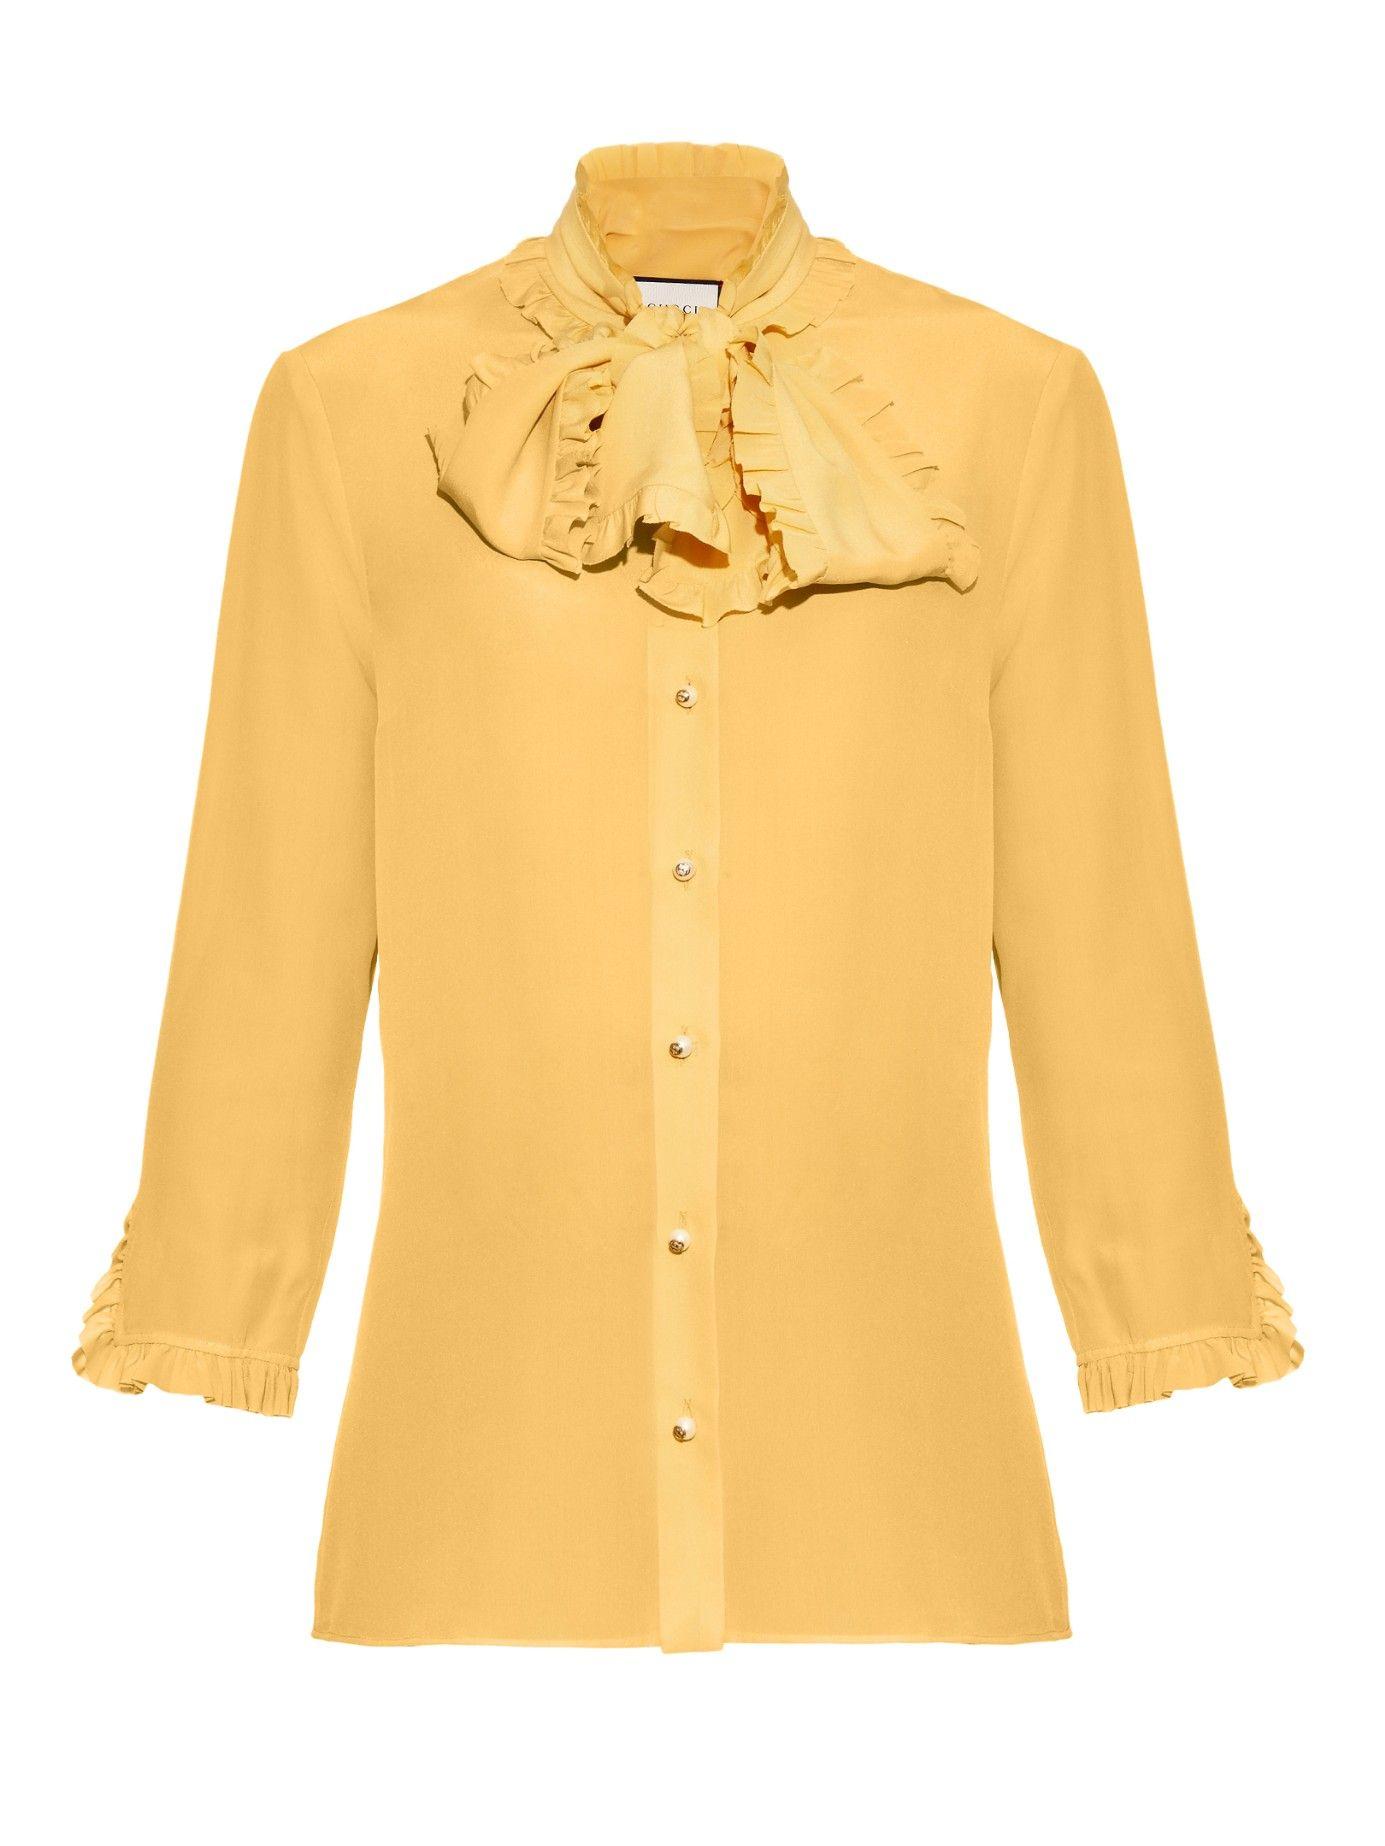 1f22dd53dda7c8 High-neck ruffled silk-crepe blouse | Gucci | Blouse in 2019 ...